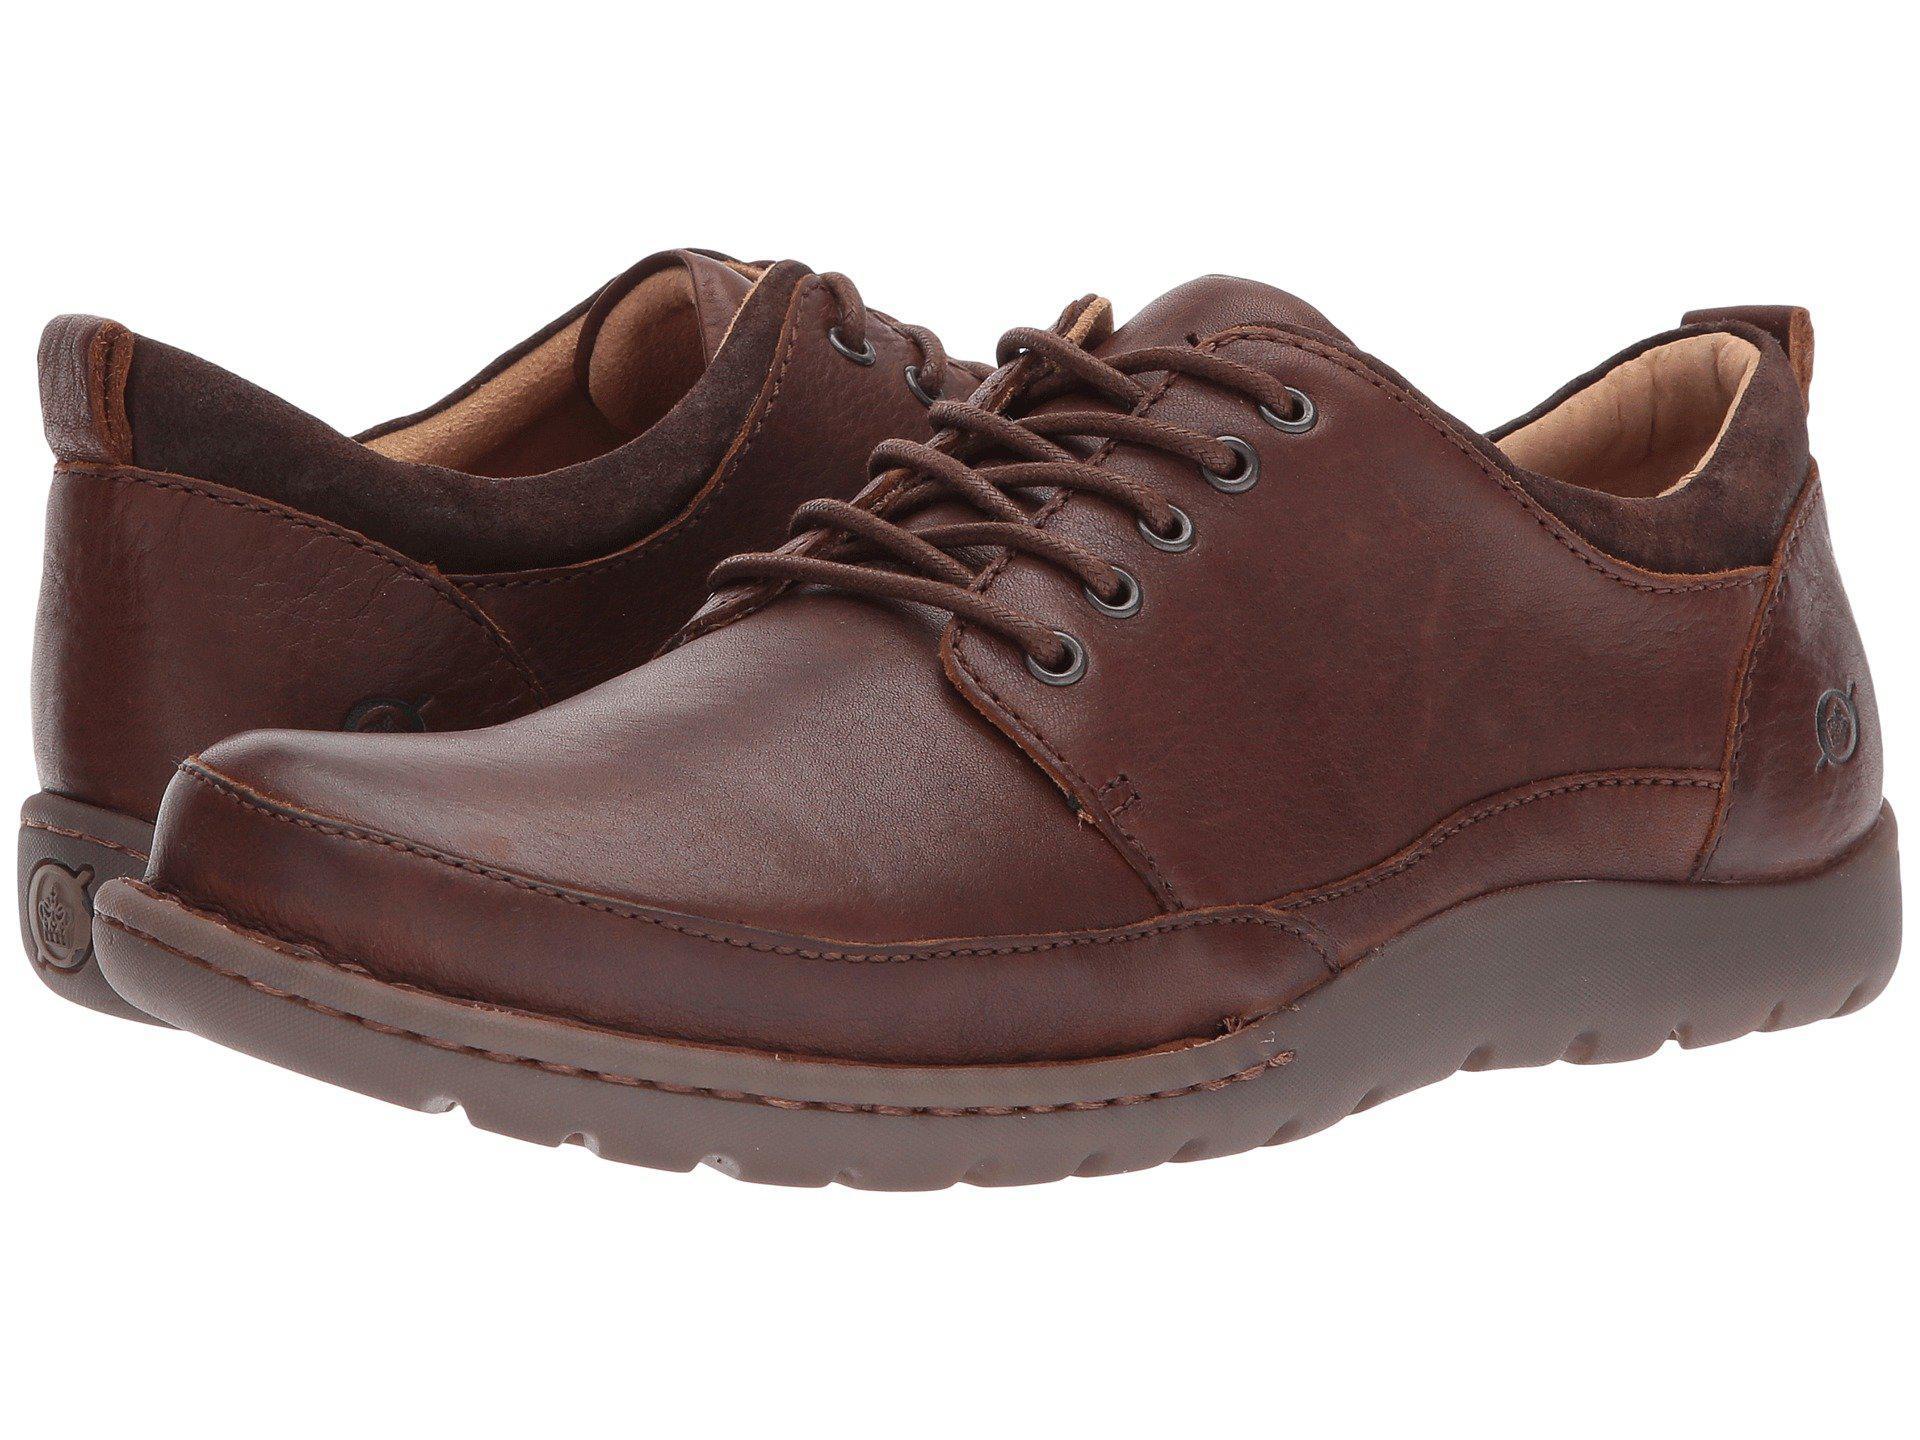 53eb60f10c15 Lyst - Born Nigel Tie (brown dark Brown Combo) Men s Lace Up Casual ...